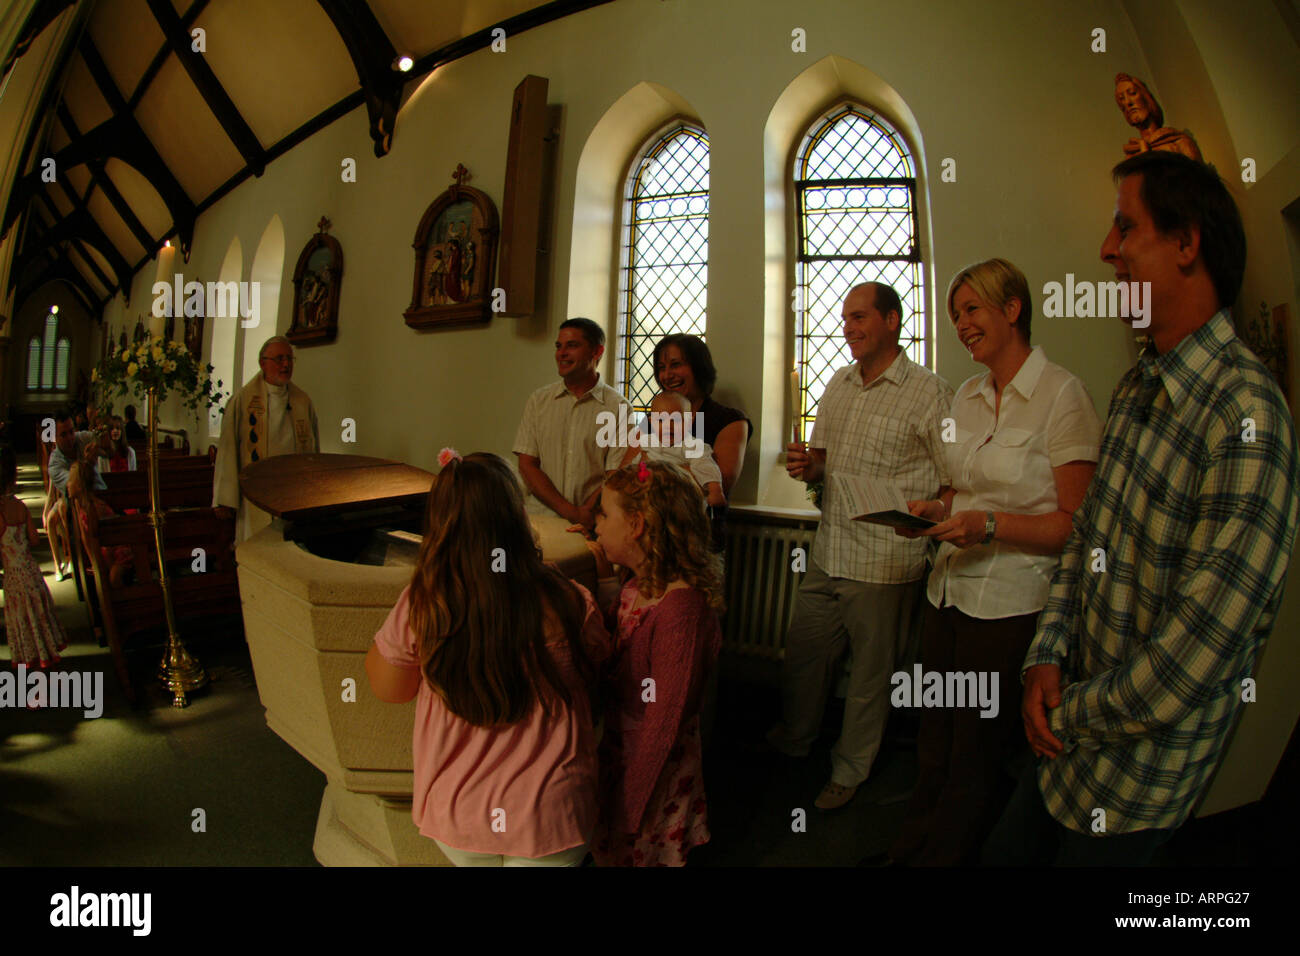 Familie Kirche Baby Taufen Taufe Feier Paten Familie